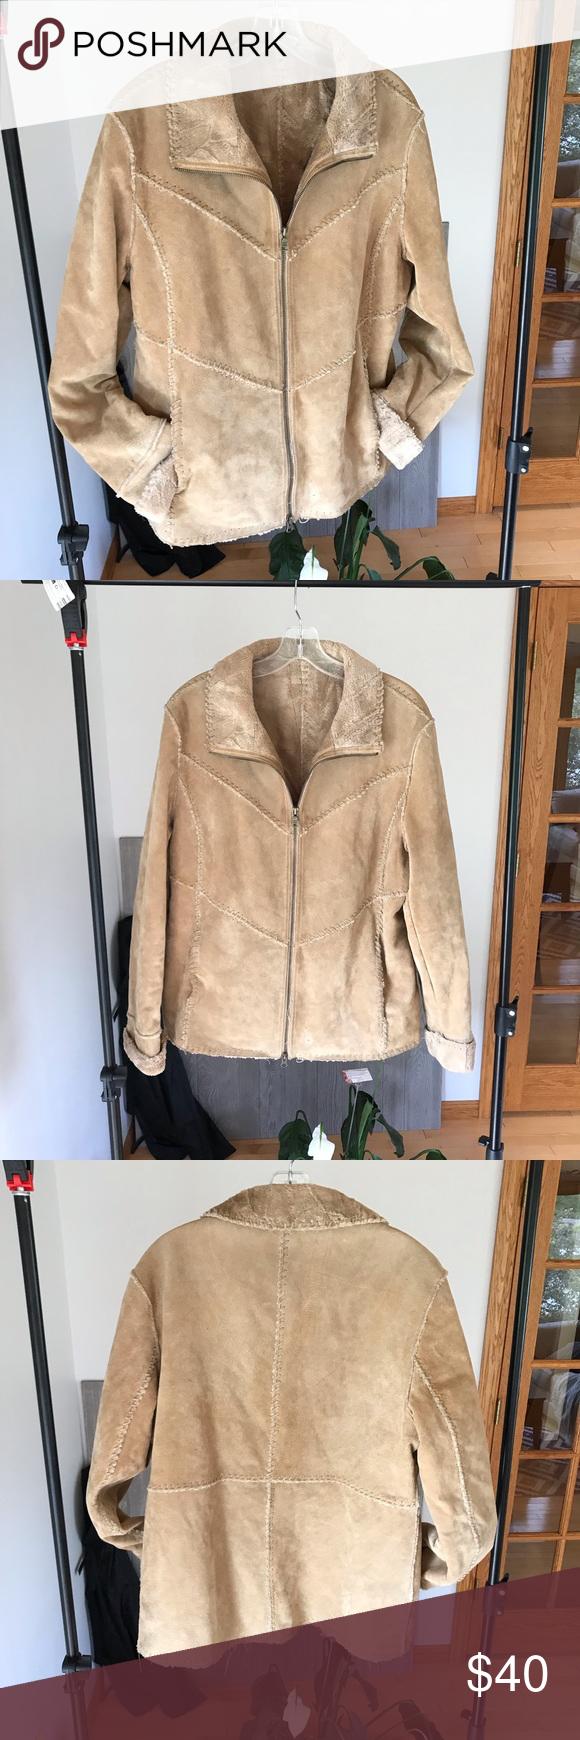 Massini Tan Leather (suede texture) jacket Textured